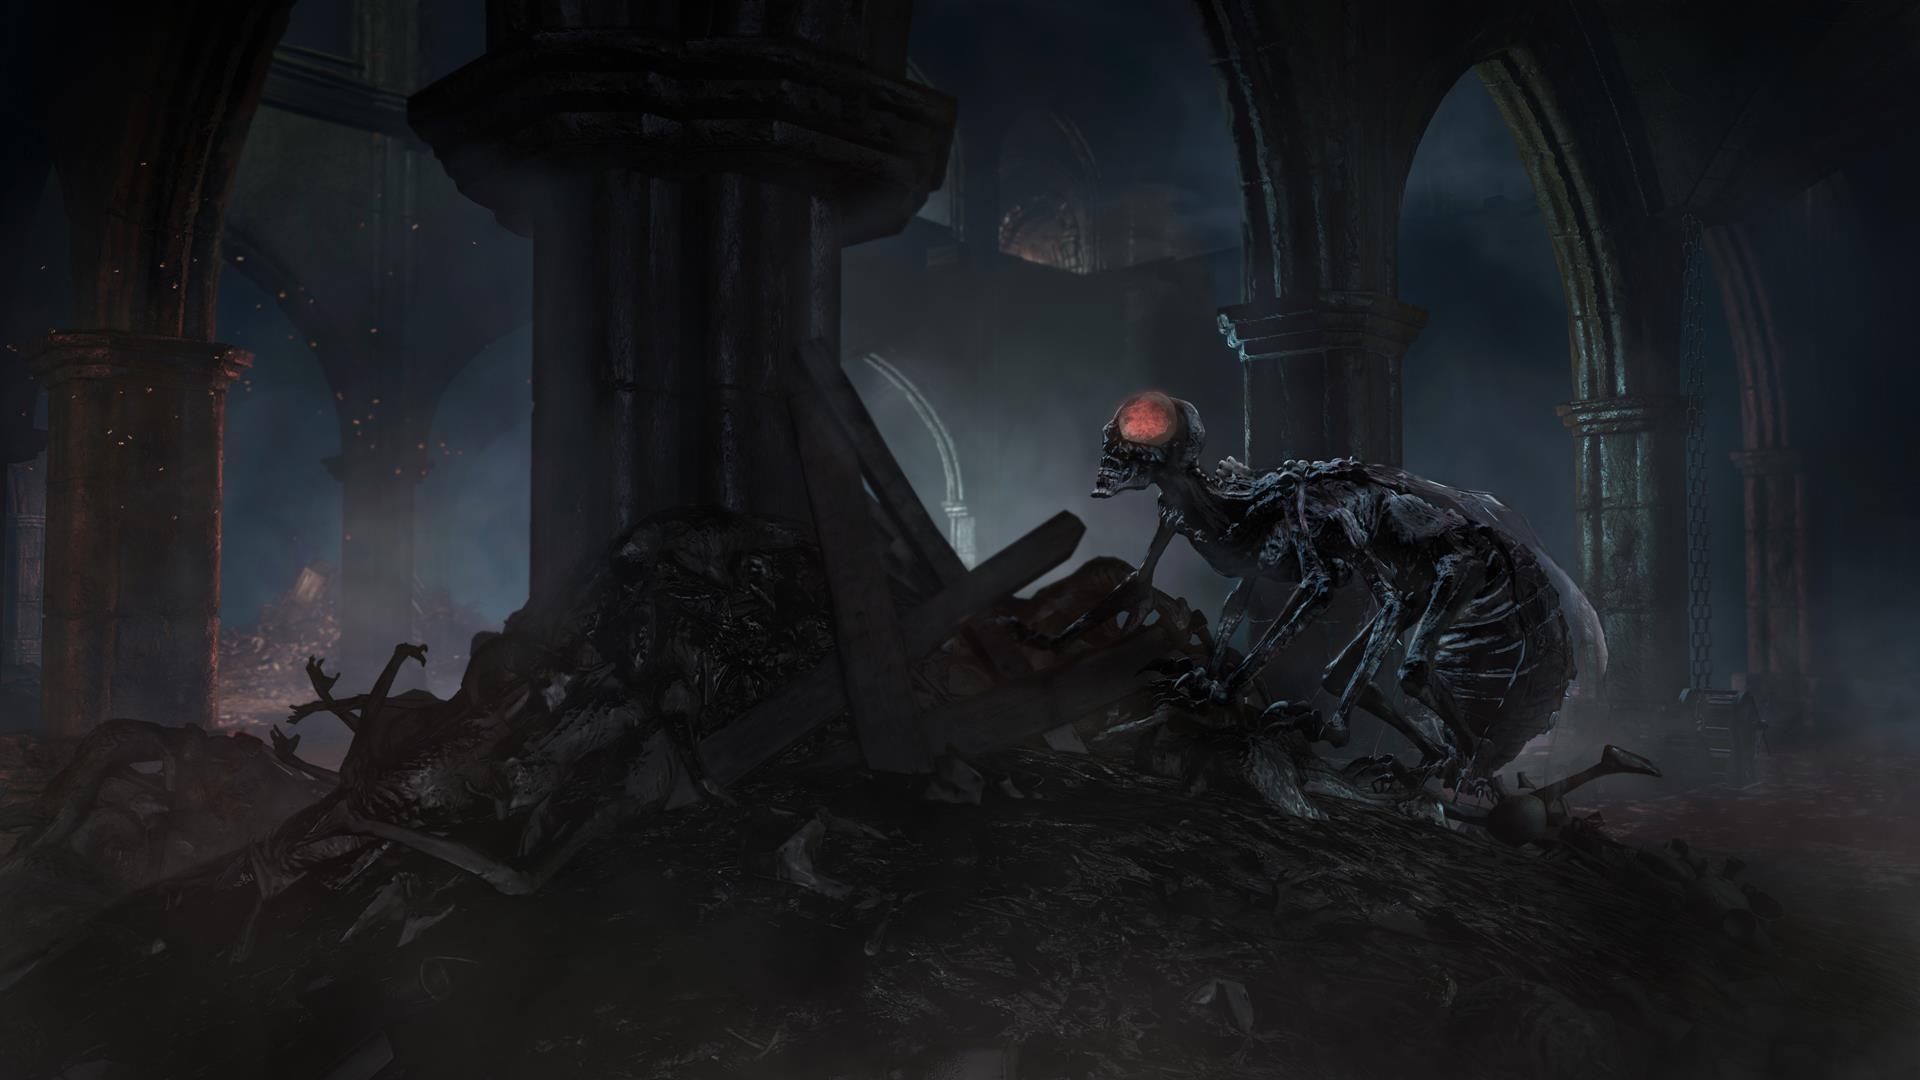 DARK SOULS 3 - Ashes of Ariandel Trailer (DLC) - YouTube